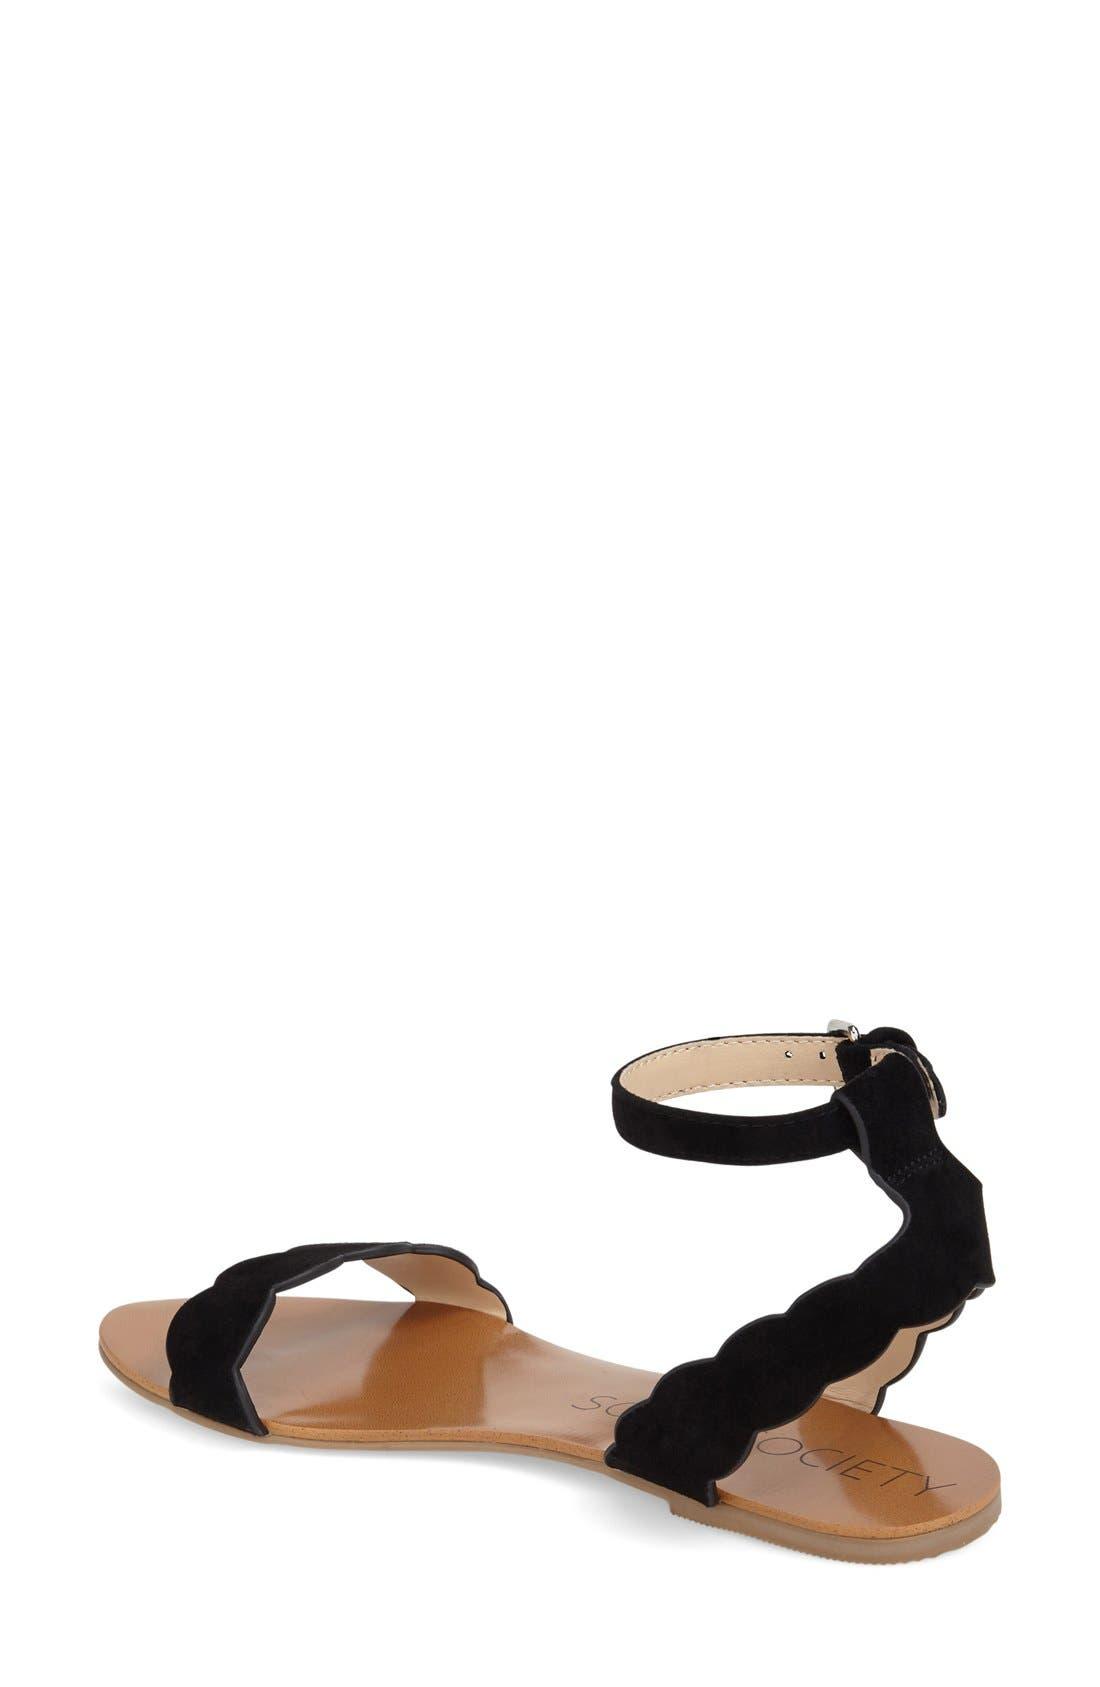 'Odette' Scalloped Ankle Strap Flat Sandal,                             Alternate thumbnail 10, color,